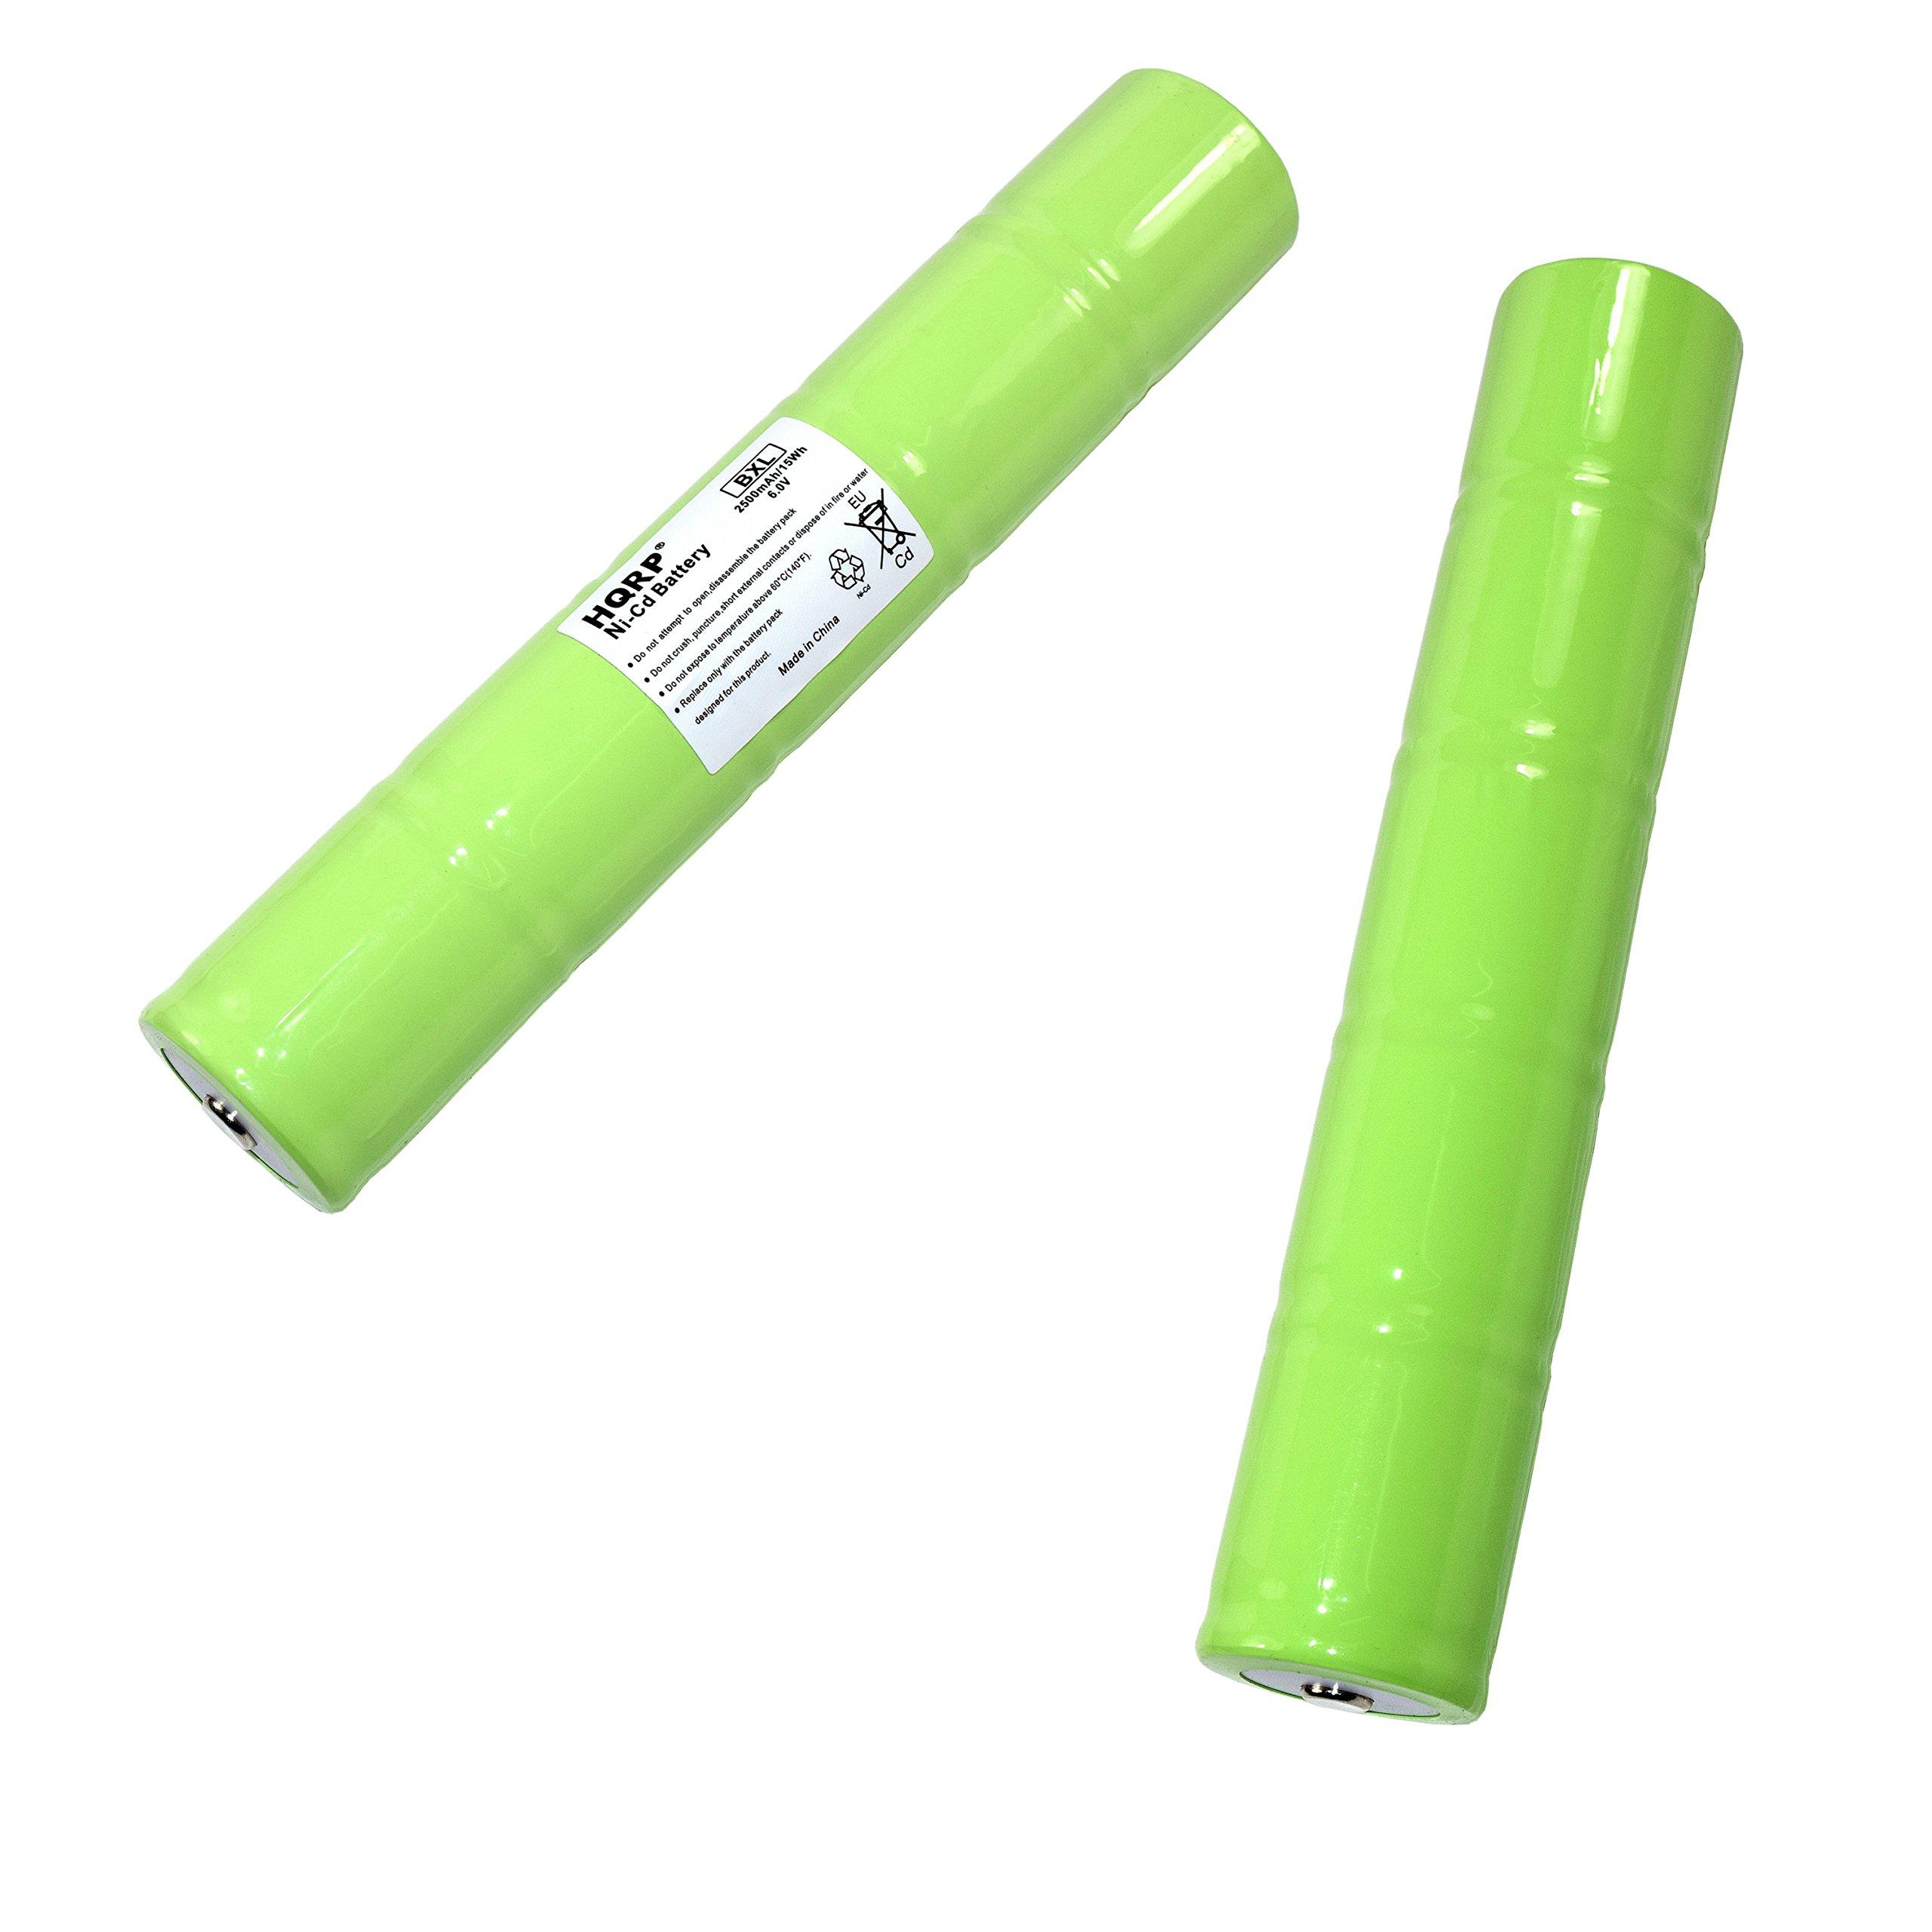 HQRP 2-Pack Battery for Sirchie Bluemaxx BM500LED BM500 BM520 BM525 Rechargeable Forensic Light with LED Bulb ESR4EE3060 6V 2500mAh BMK705 BMK705220 BMK755 BMK755220 Flashlight + HQRP Coaster